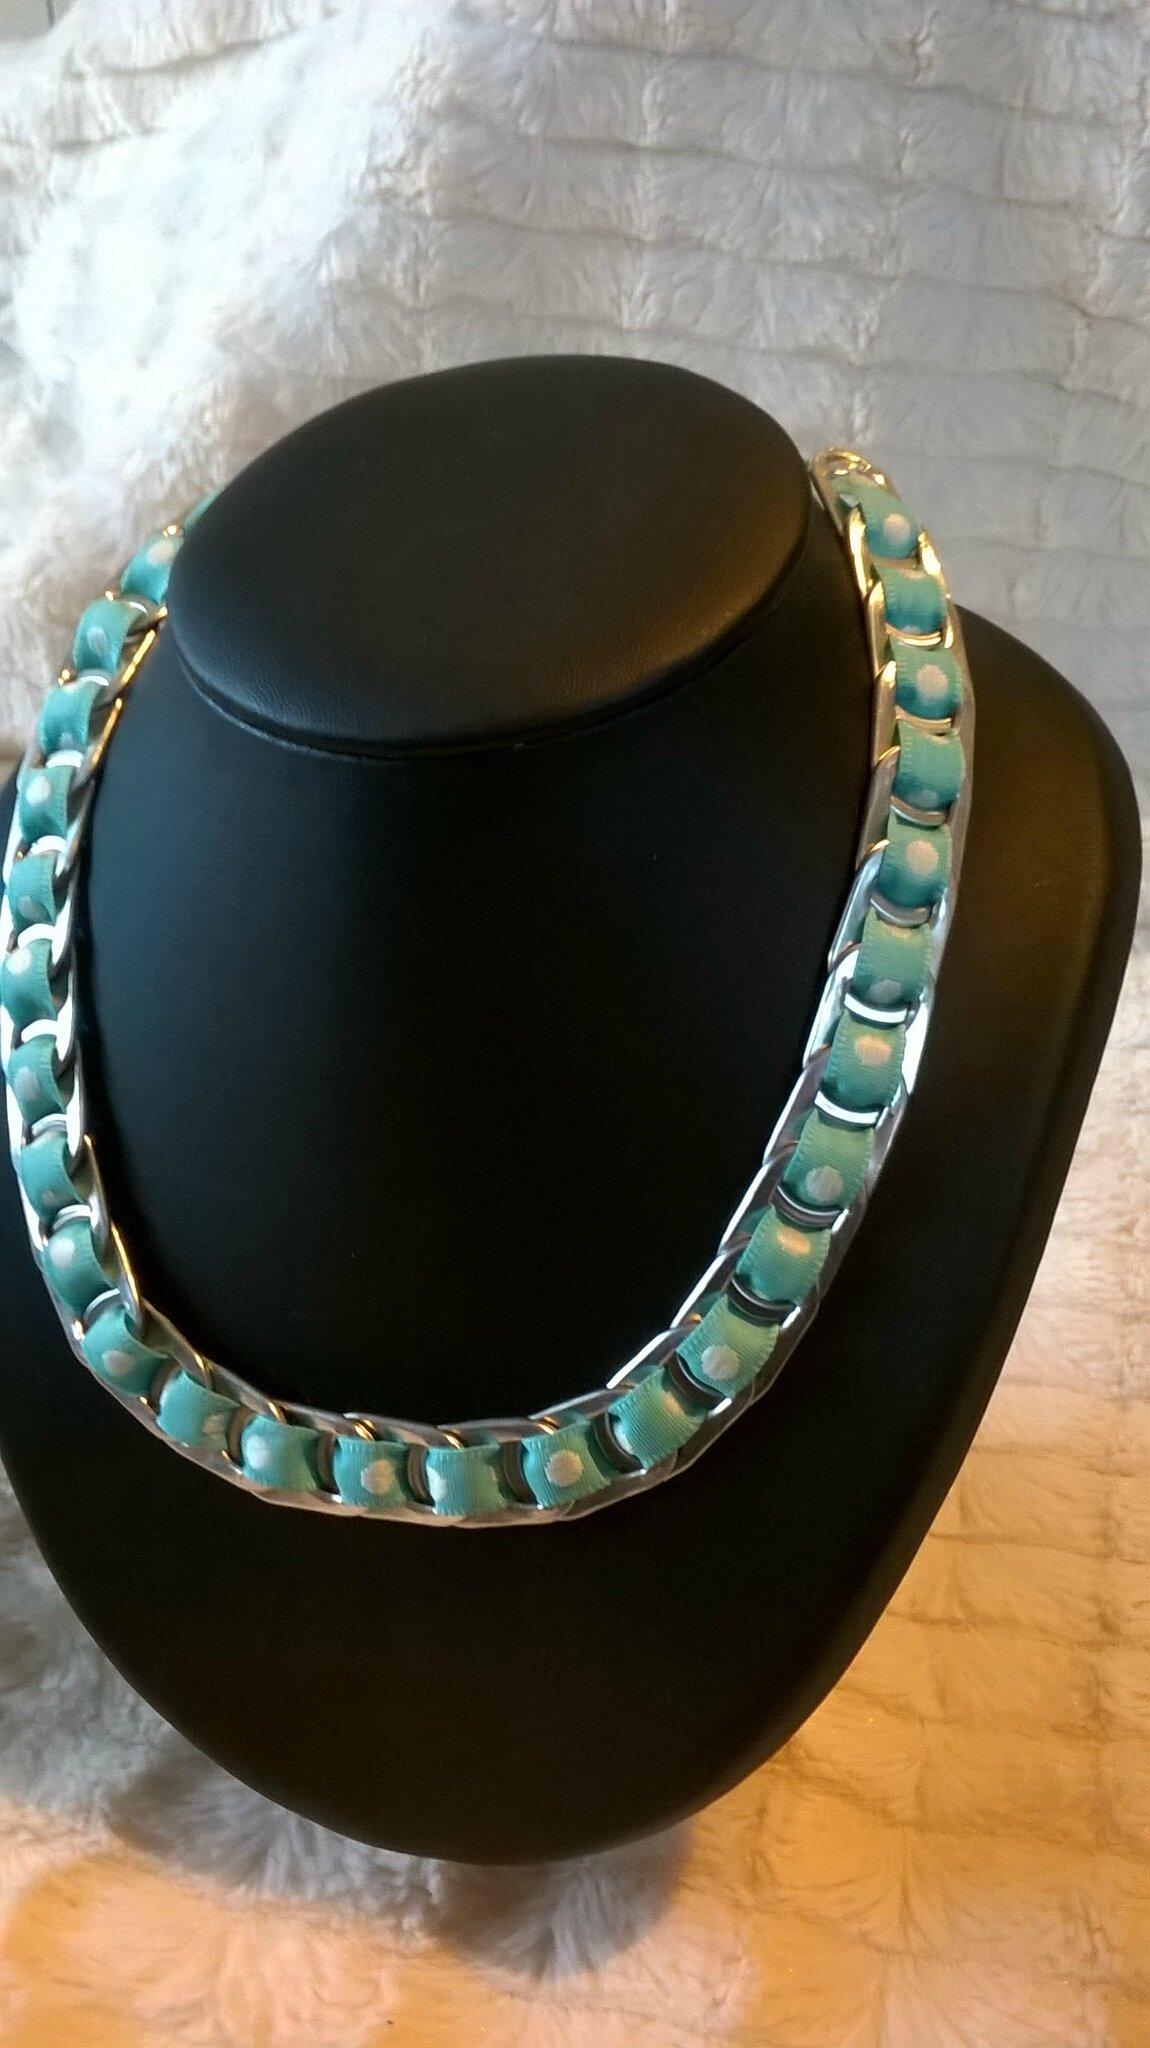 collier ruban turquoise et gros poids blancs